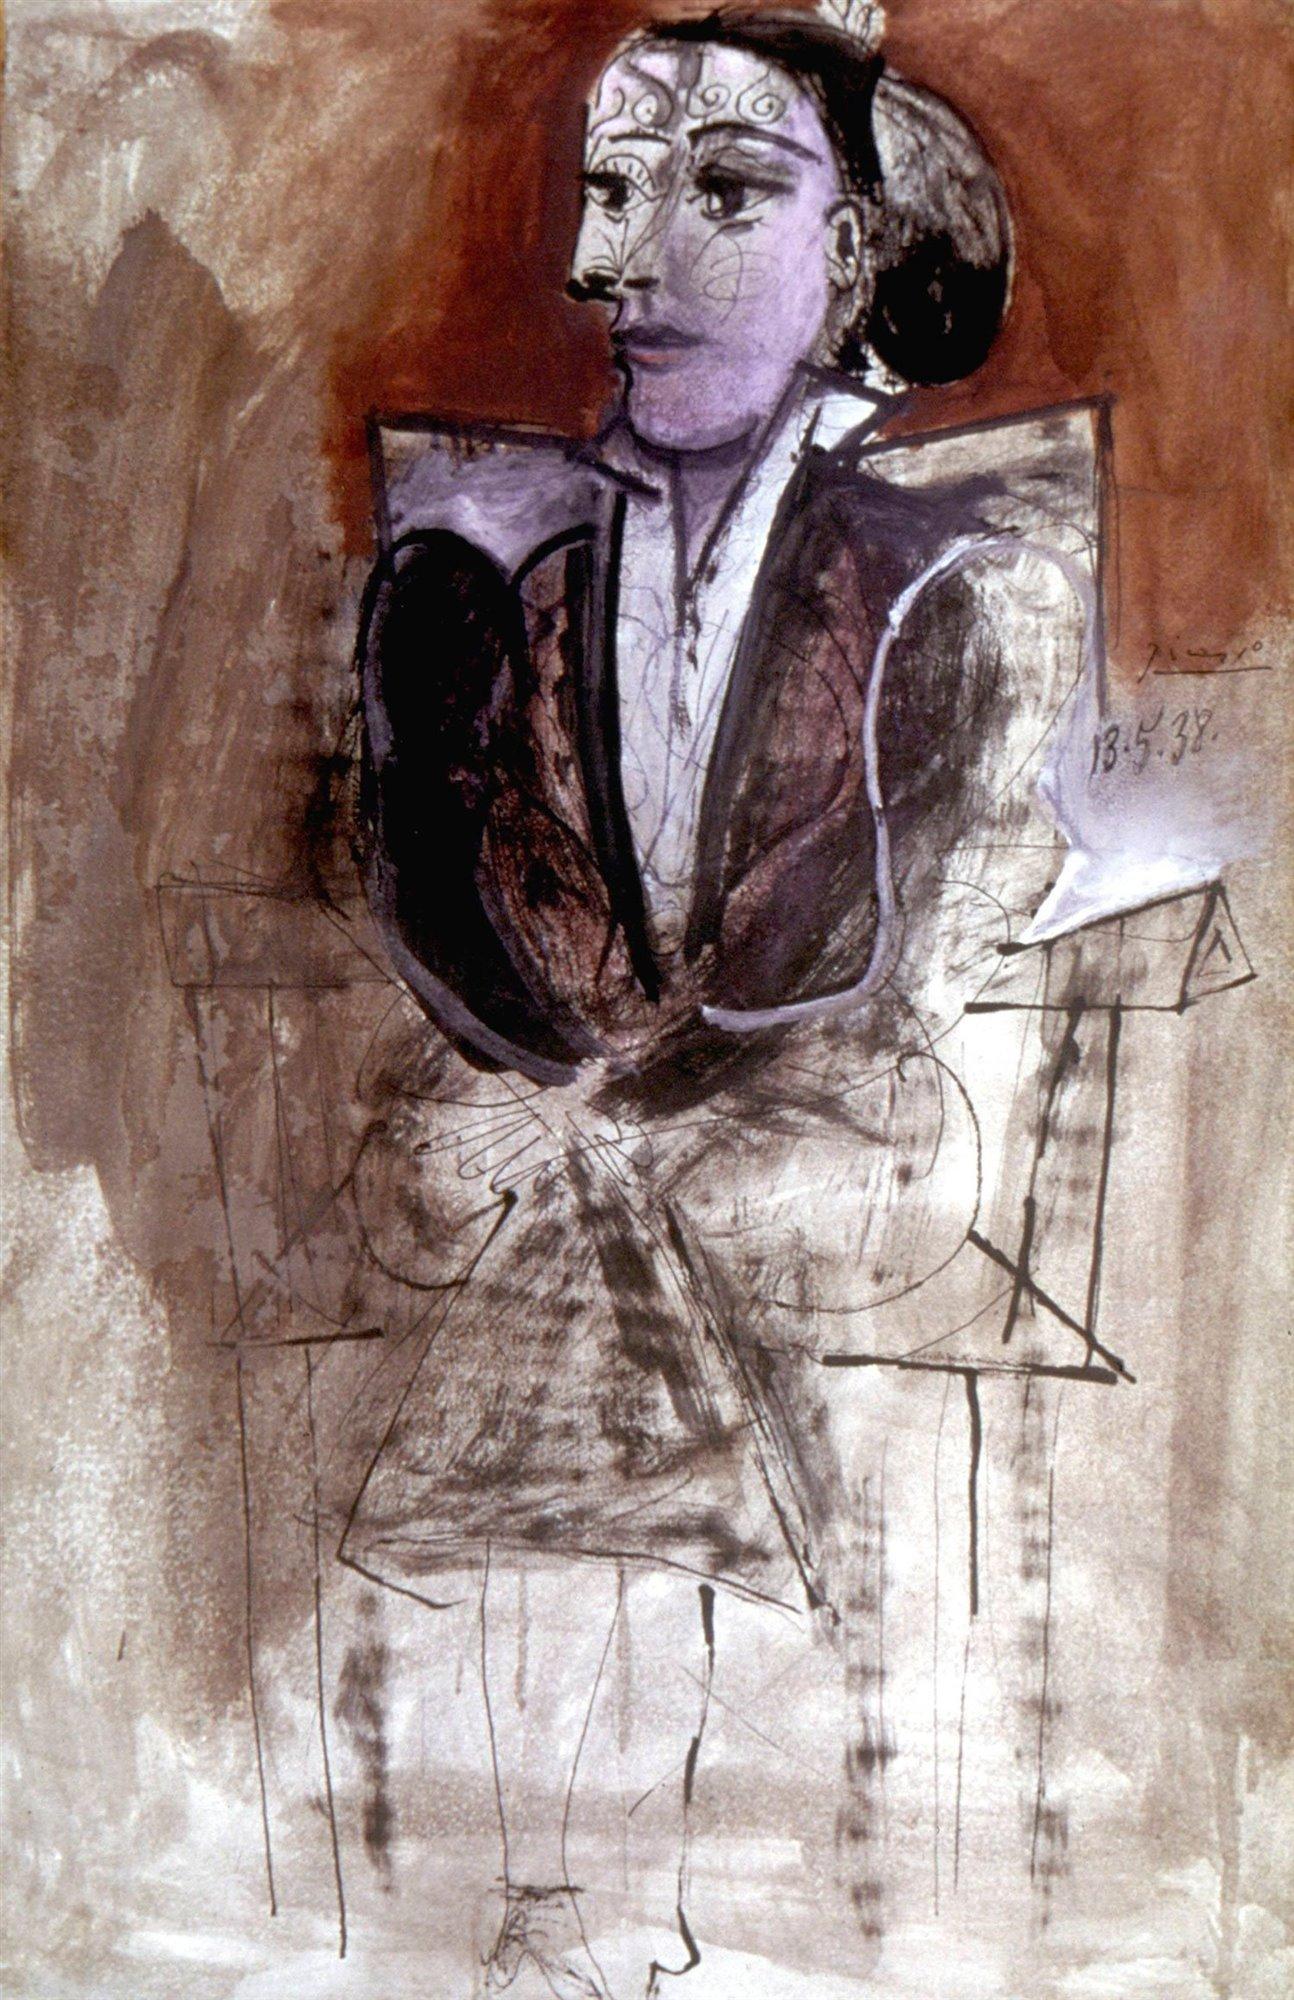 Pablo Picasso, Dora Maar seduta, 1938, The Granger Collection, New York